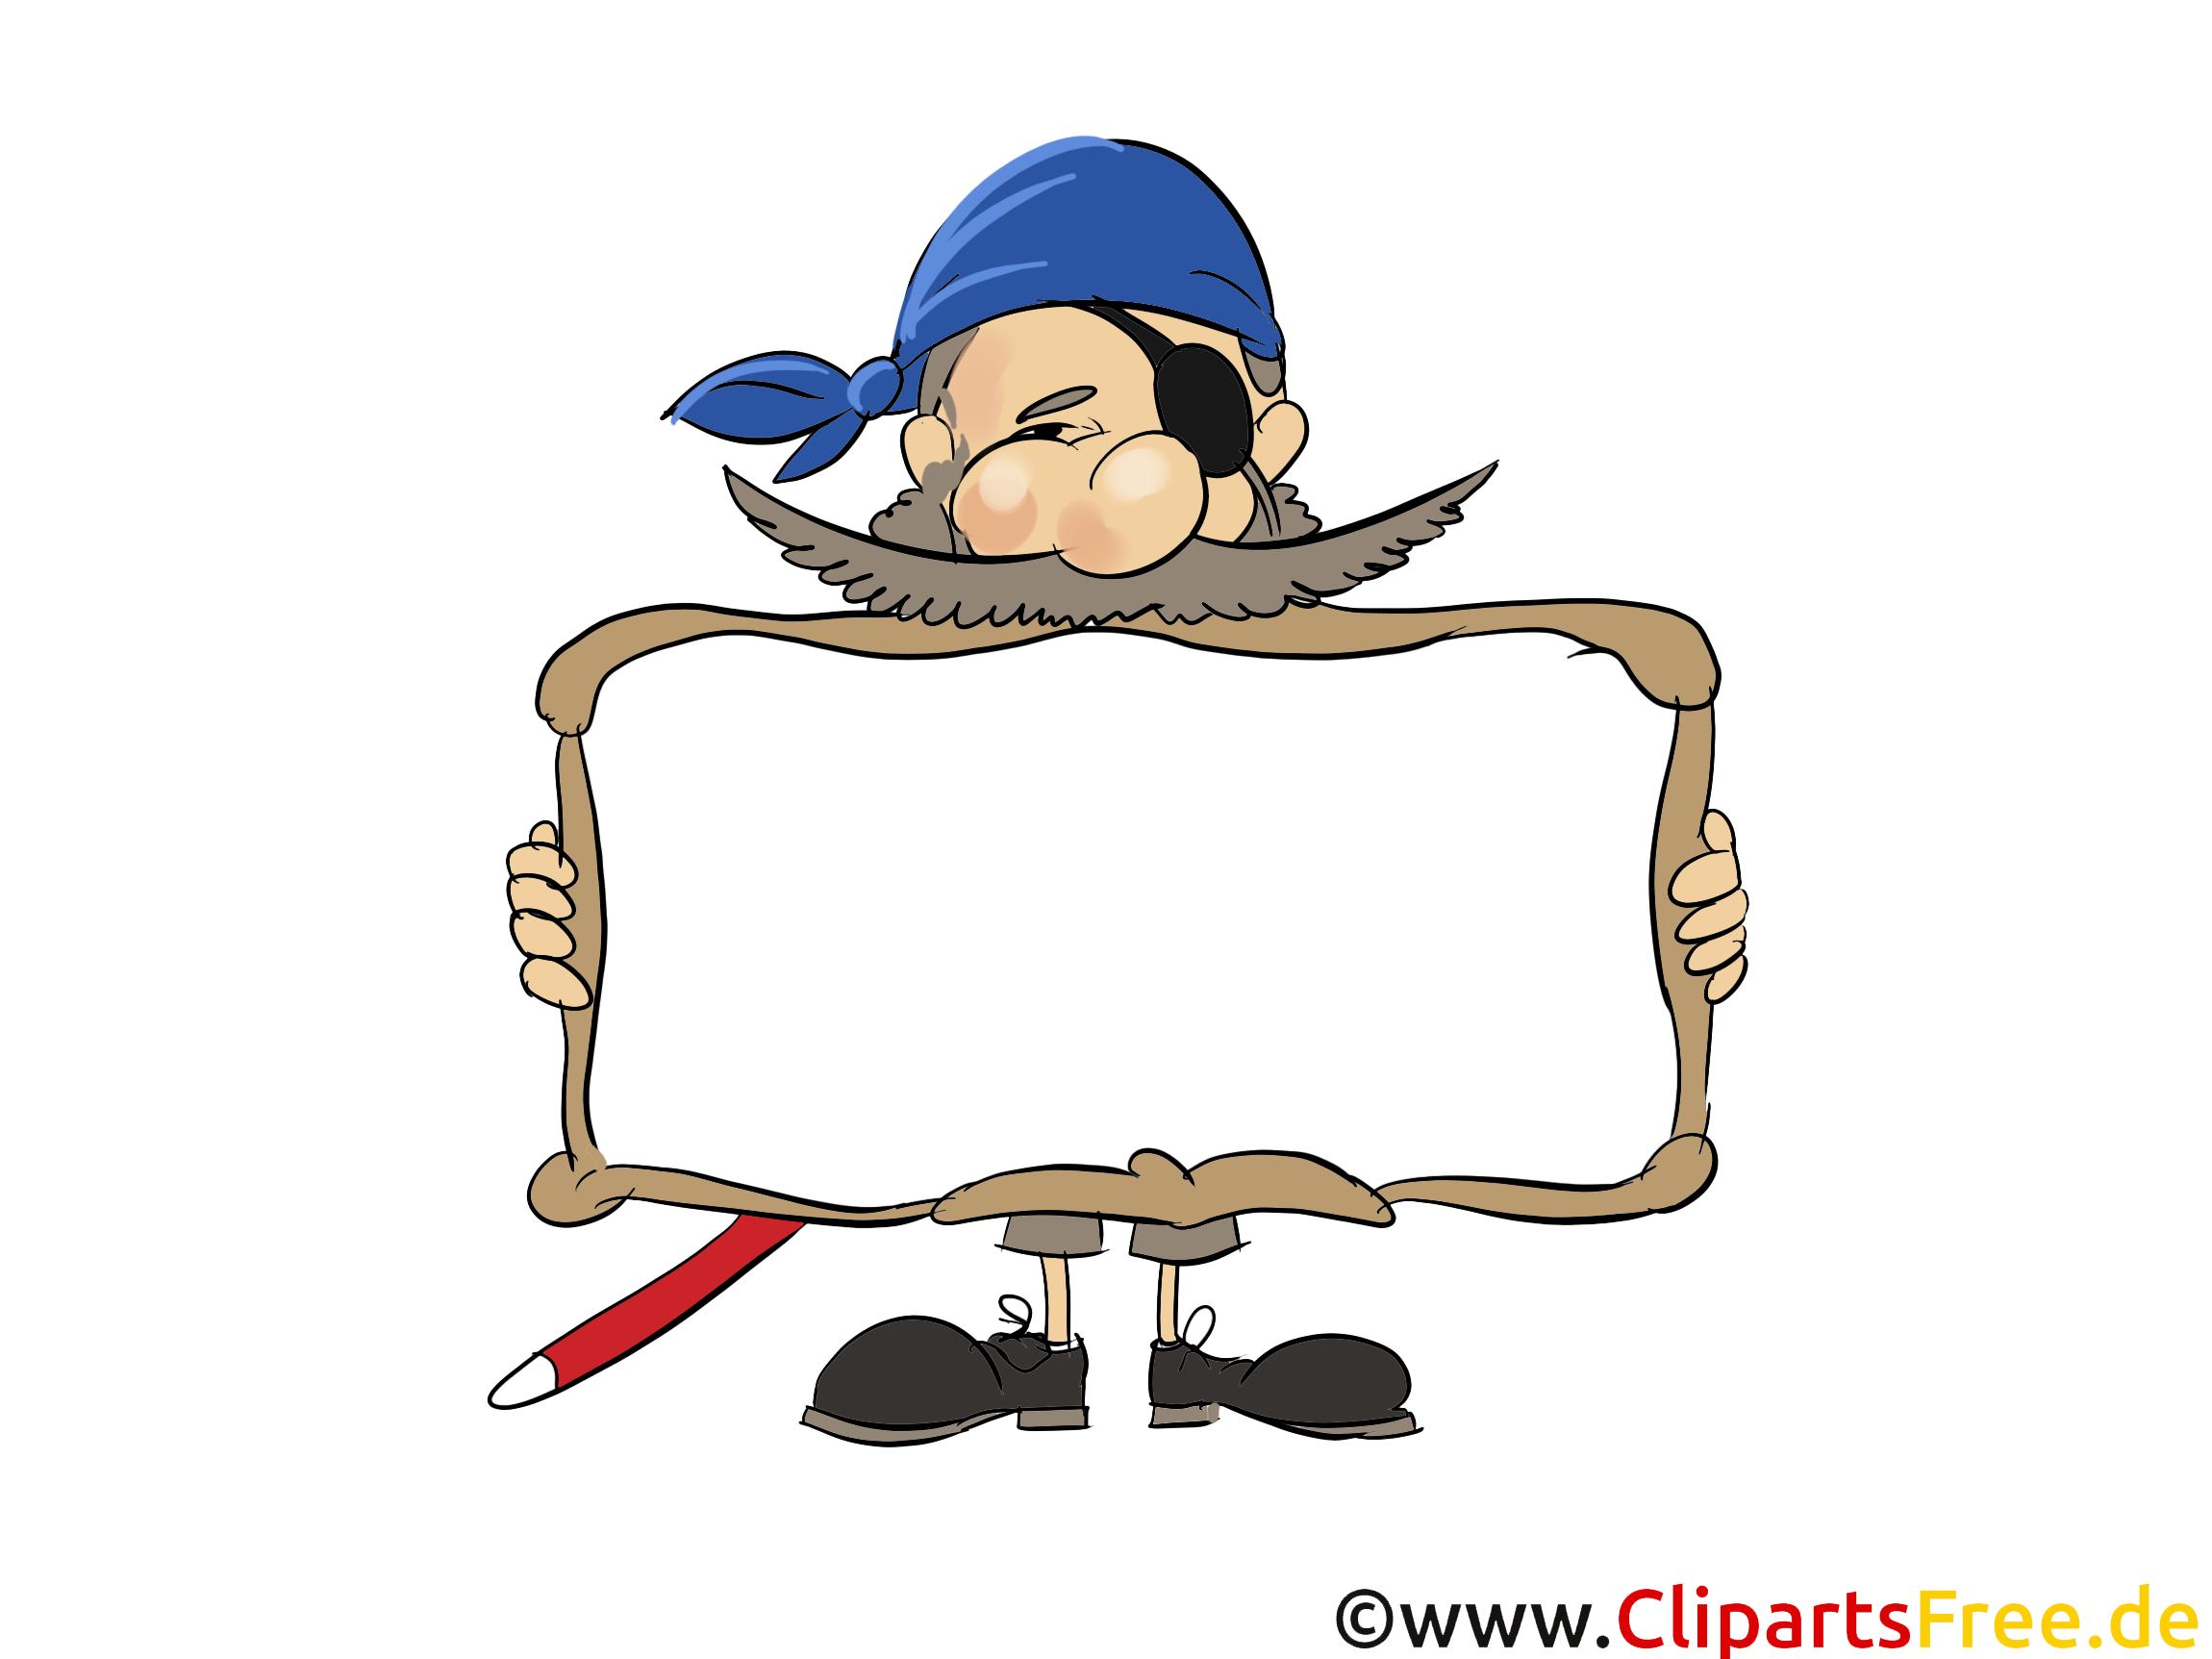 Pirat mit Rahmen zum Beschriften Bild, Clipart, Grafik